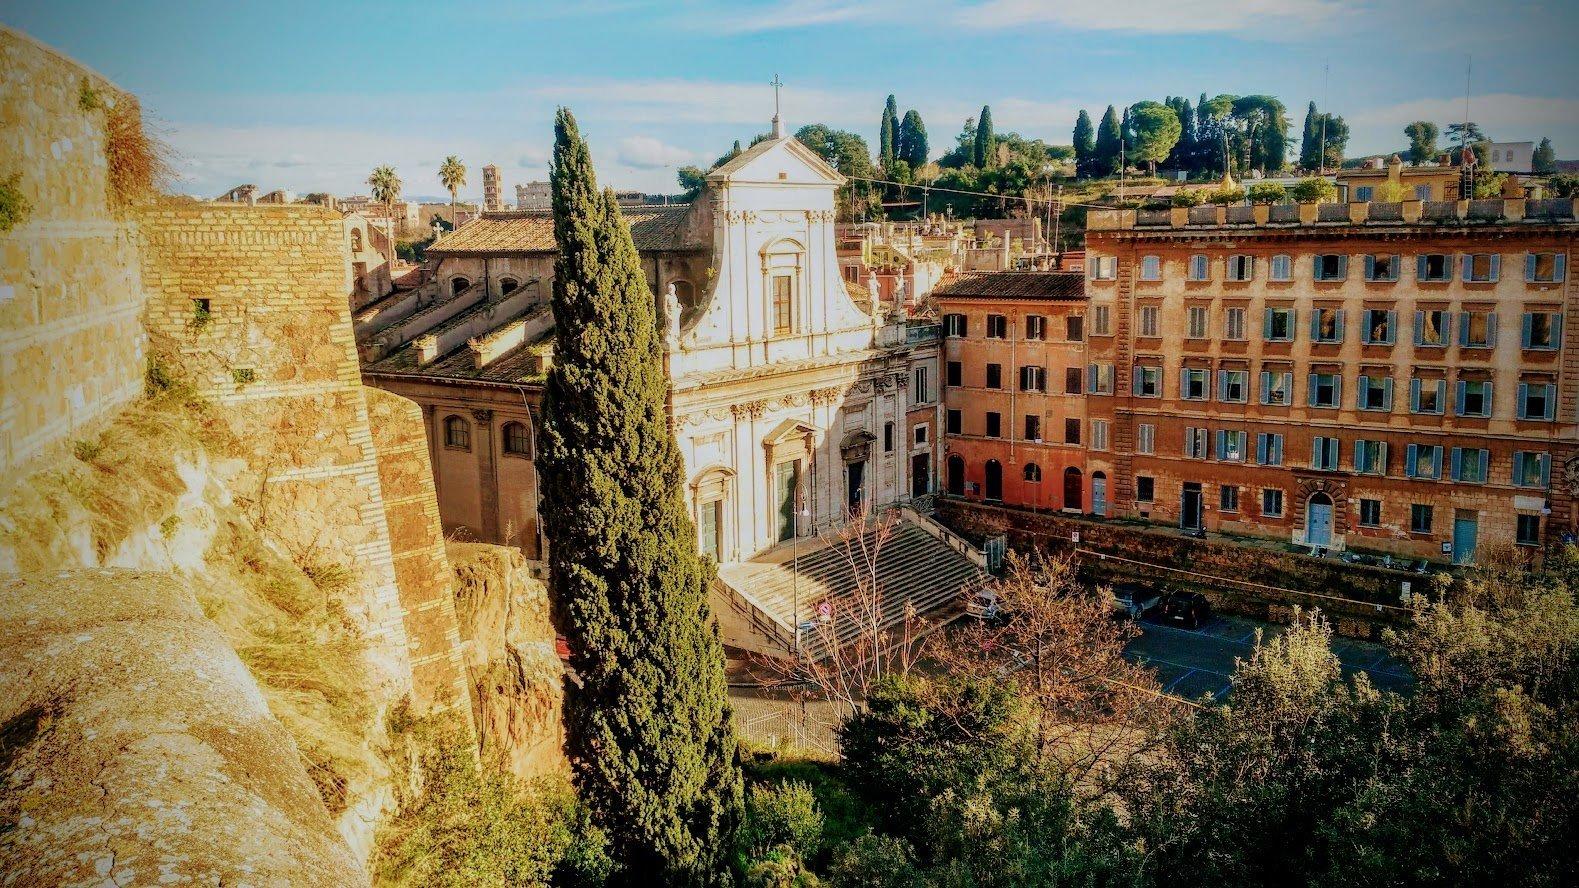 Санта-Мария делла Консолационе, Рим, Италия. Январь 2019